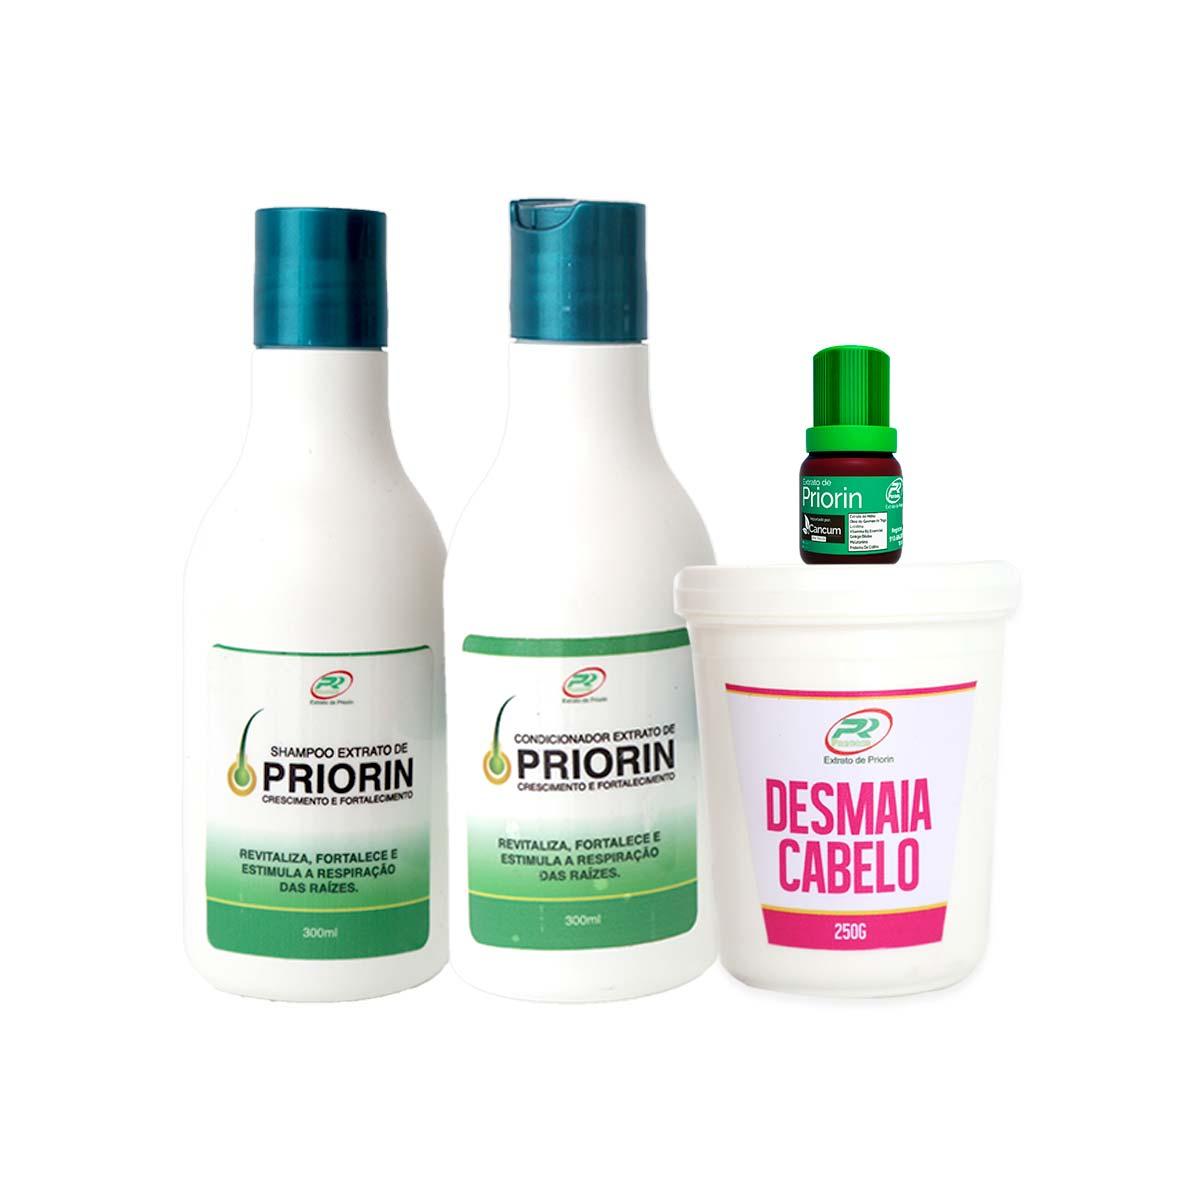 Tônico Capilar (cresce cabelo) + Shampoo e Condicionador + Desmaia Cabelo